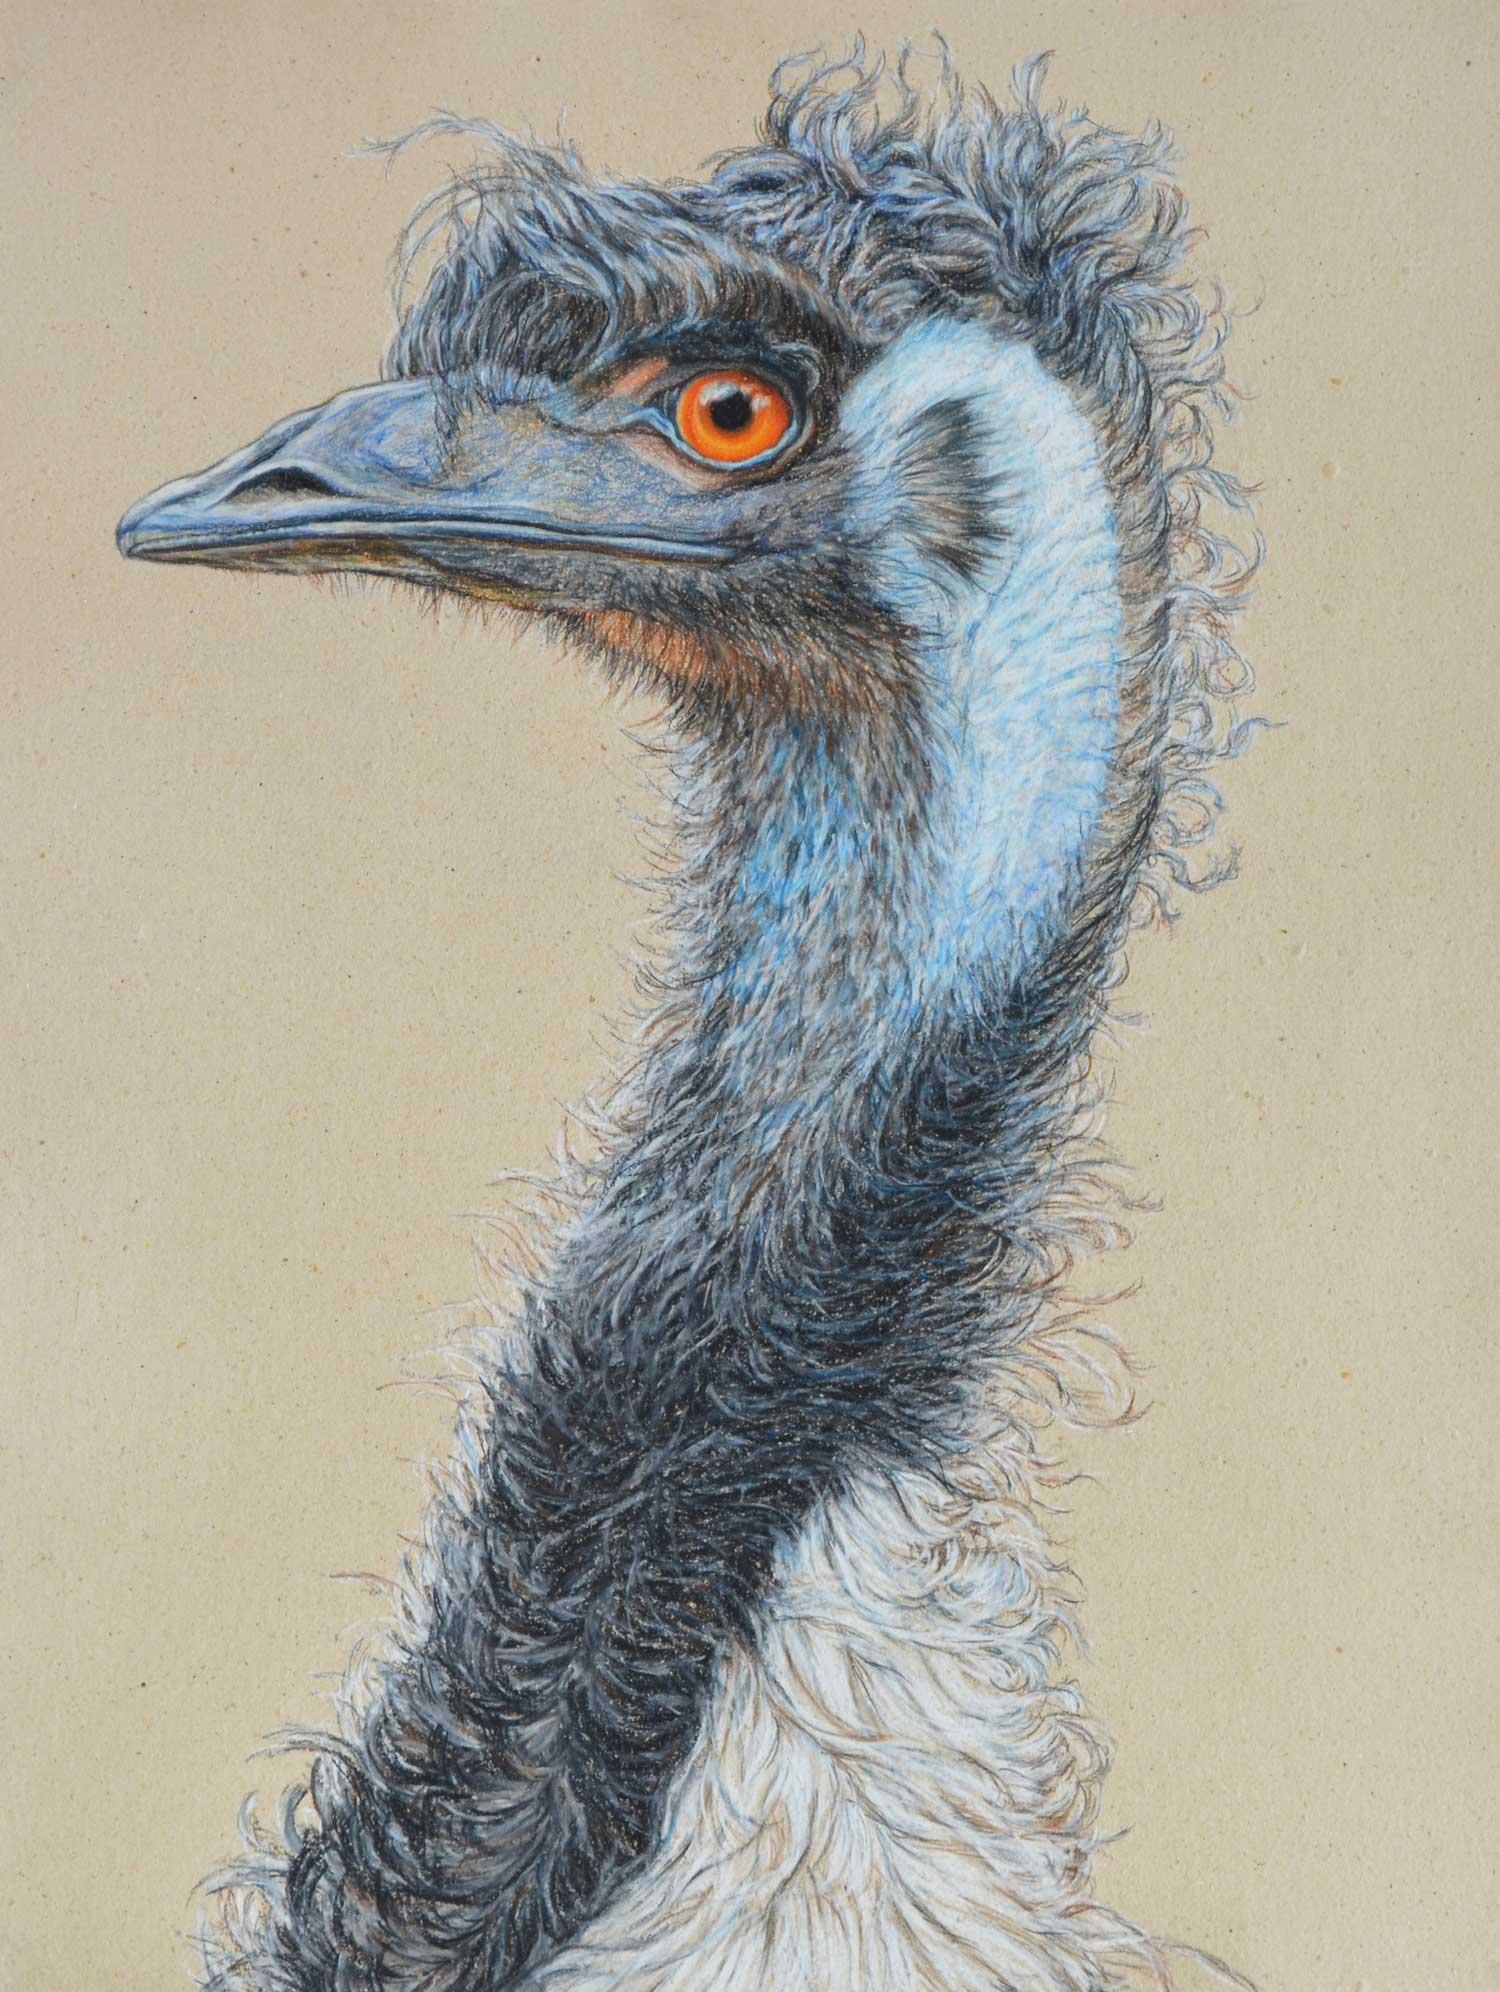 emu-portrait-drawing-rachel-newling.jpg